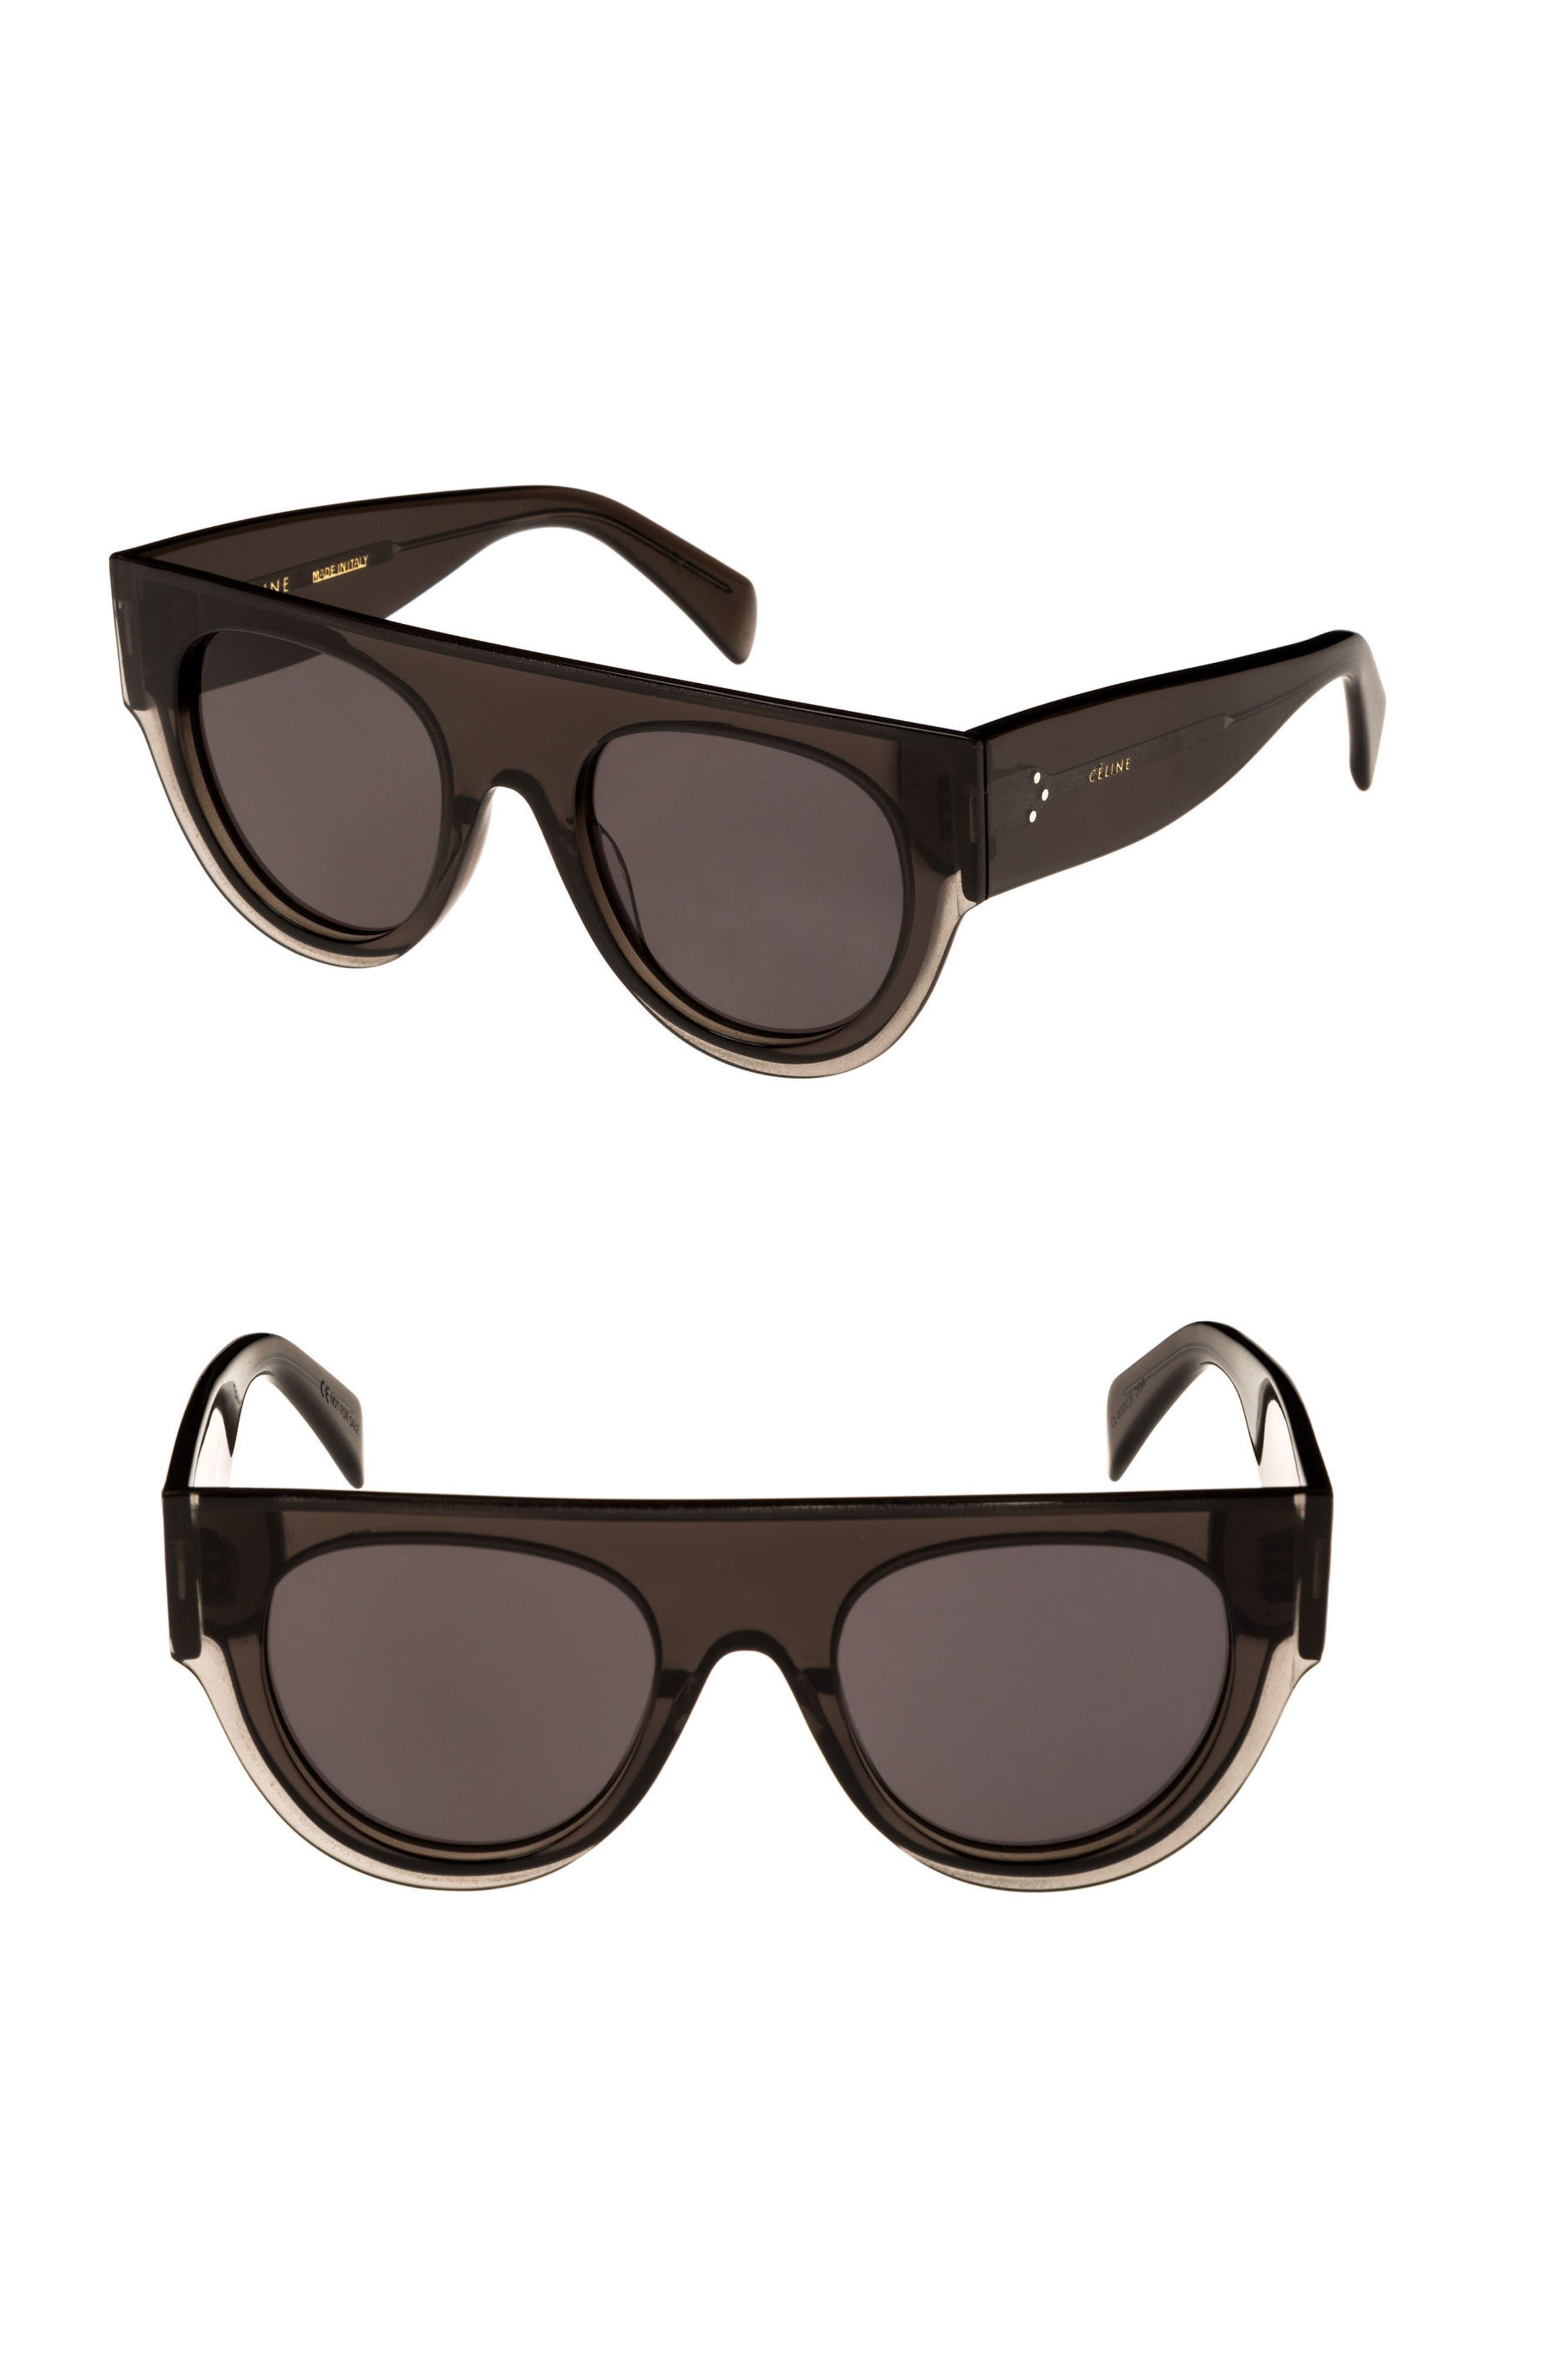 51mm Pilot Sunglasses,                             Main thumbnail 1, color,                             DARK GREY/ SMOKE